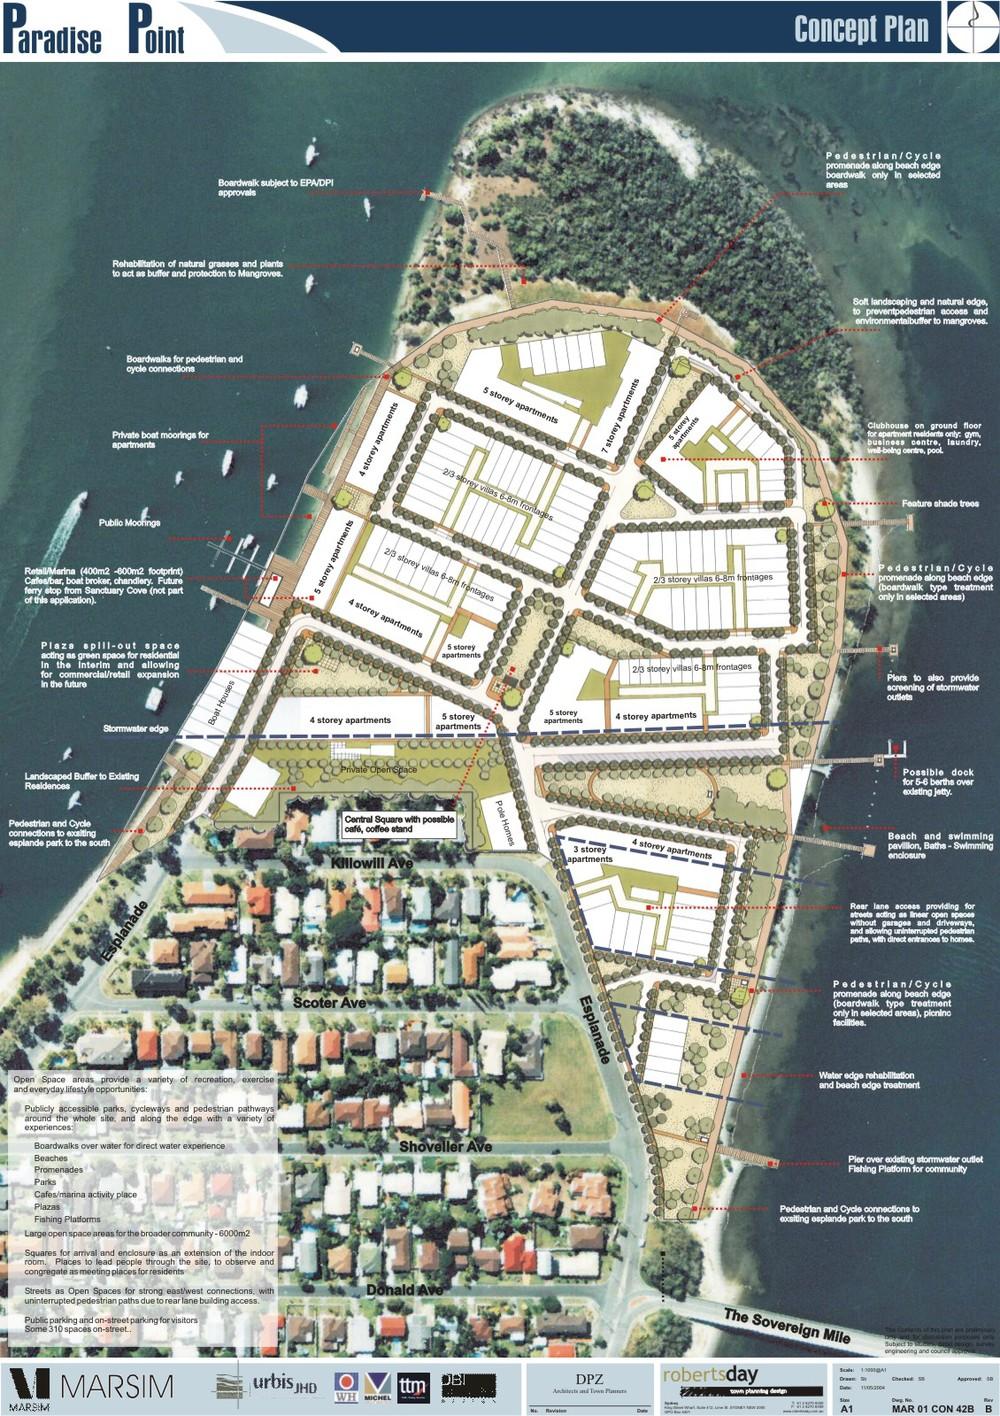 Paradise Point masterplan